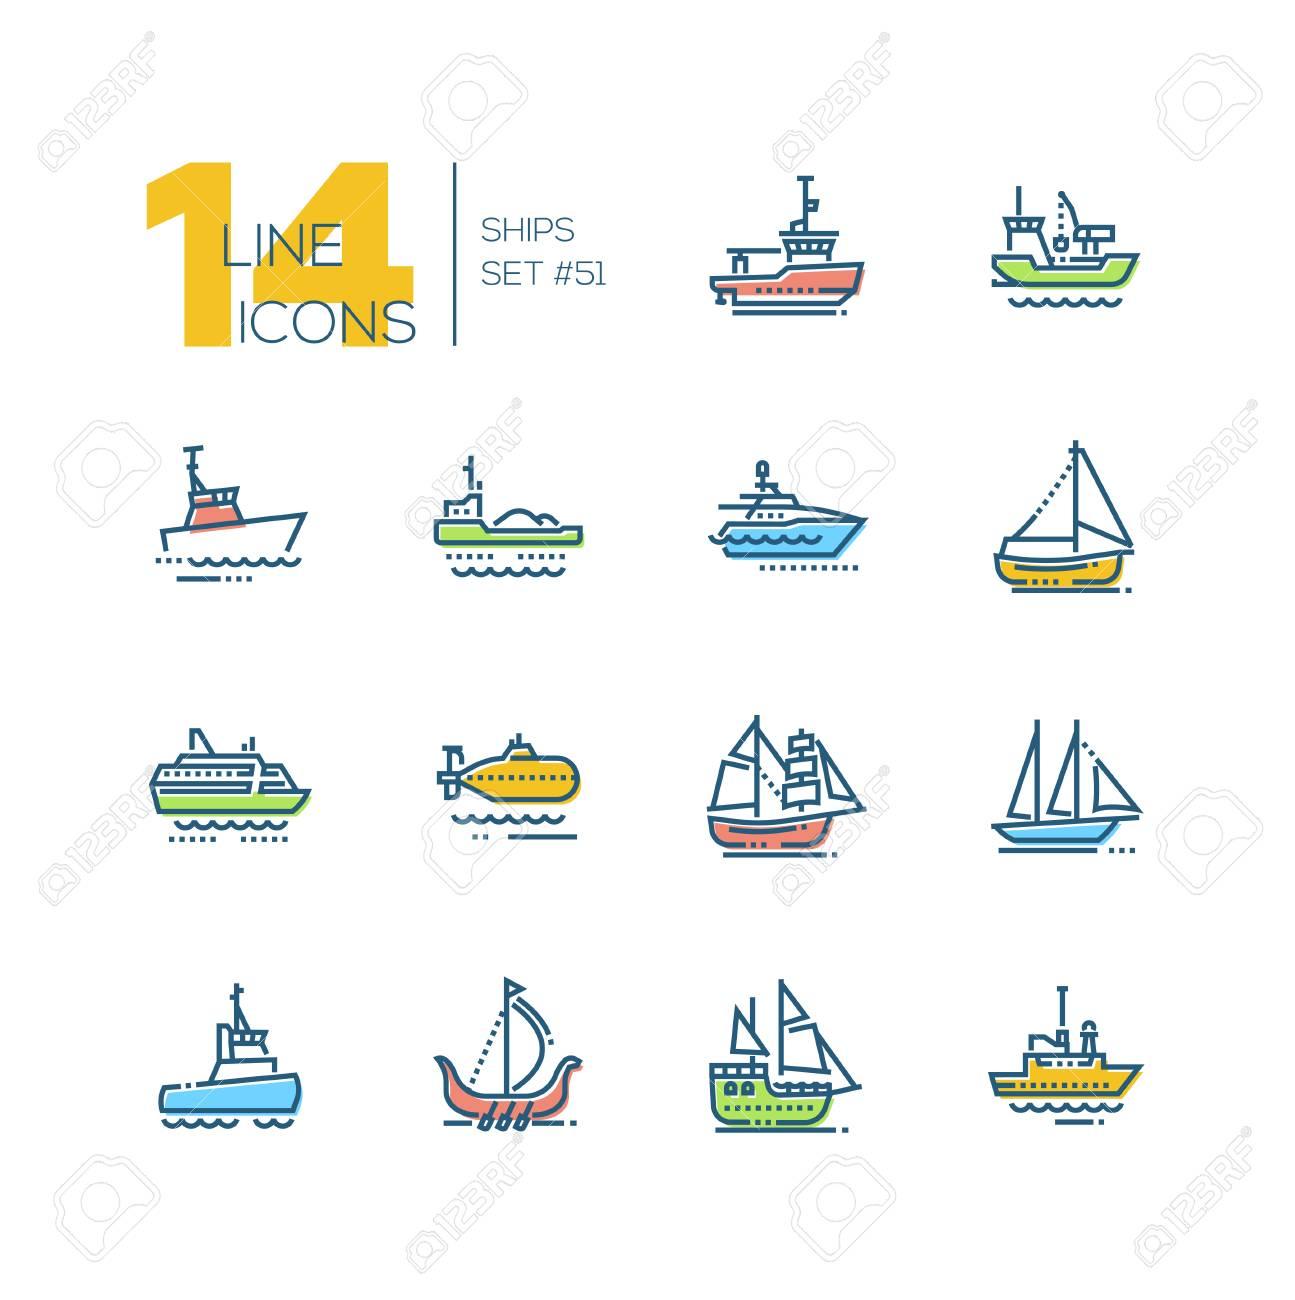 Water transport - colorful line design icons set. Tugboat, dredging vessel, yacht, self-propelled barge, patrol boat, ferry, submarine, brigantine, schooner, drakkar, pirate, survey, military ship - 112311879